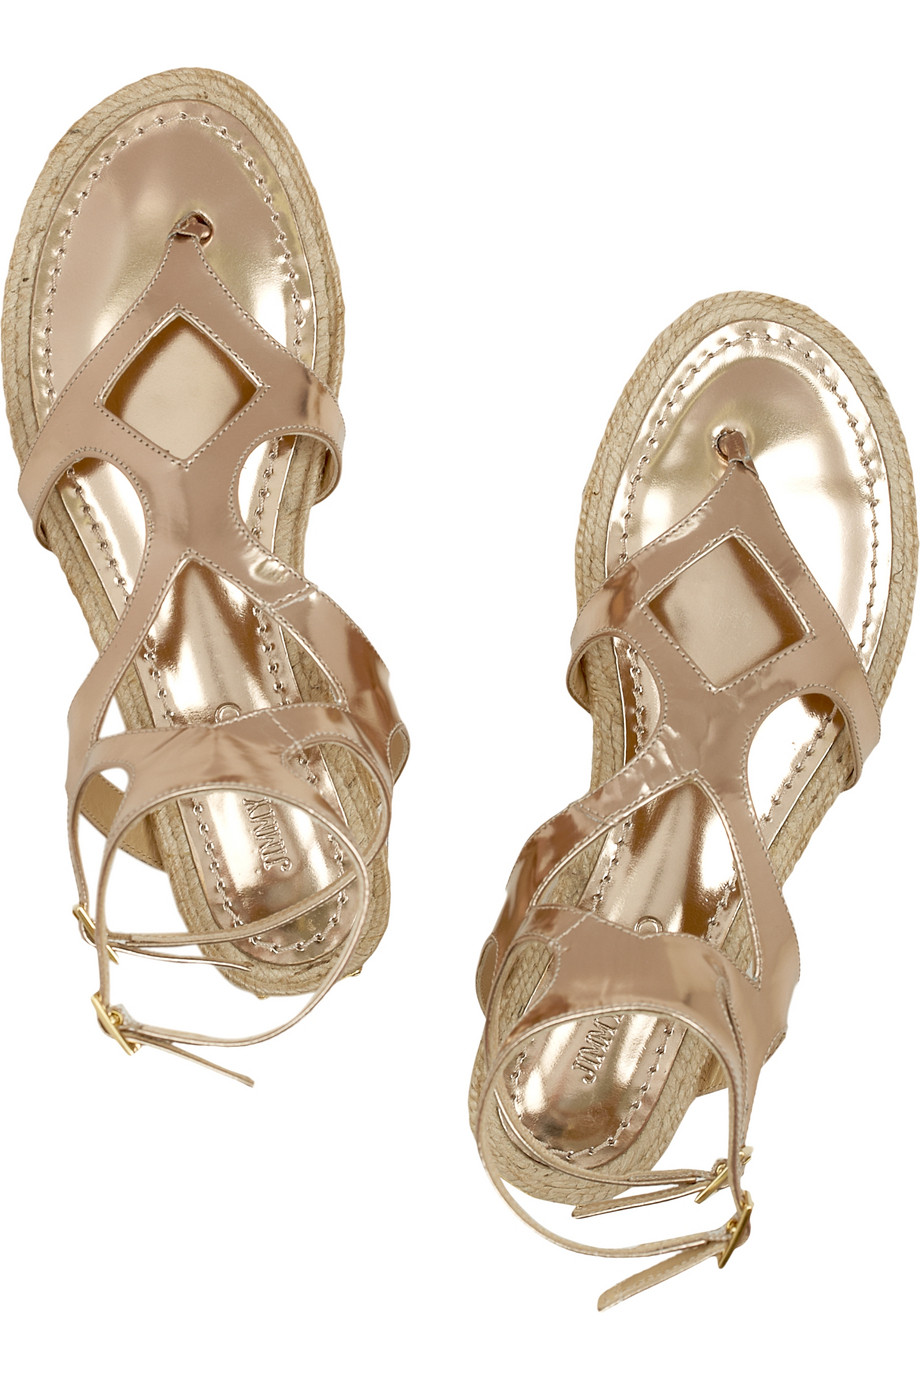 9656f2835b4c7 Jimmy Choo Peachy Metallic Leather Gladiator Sandals in Metallic - Lyst